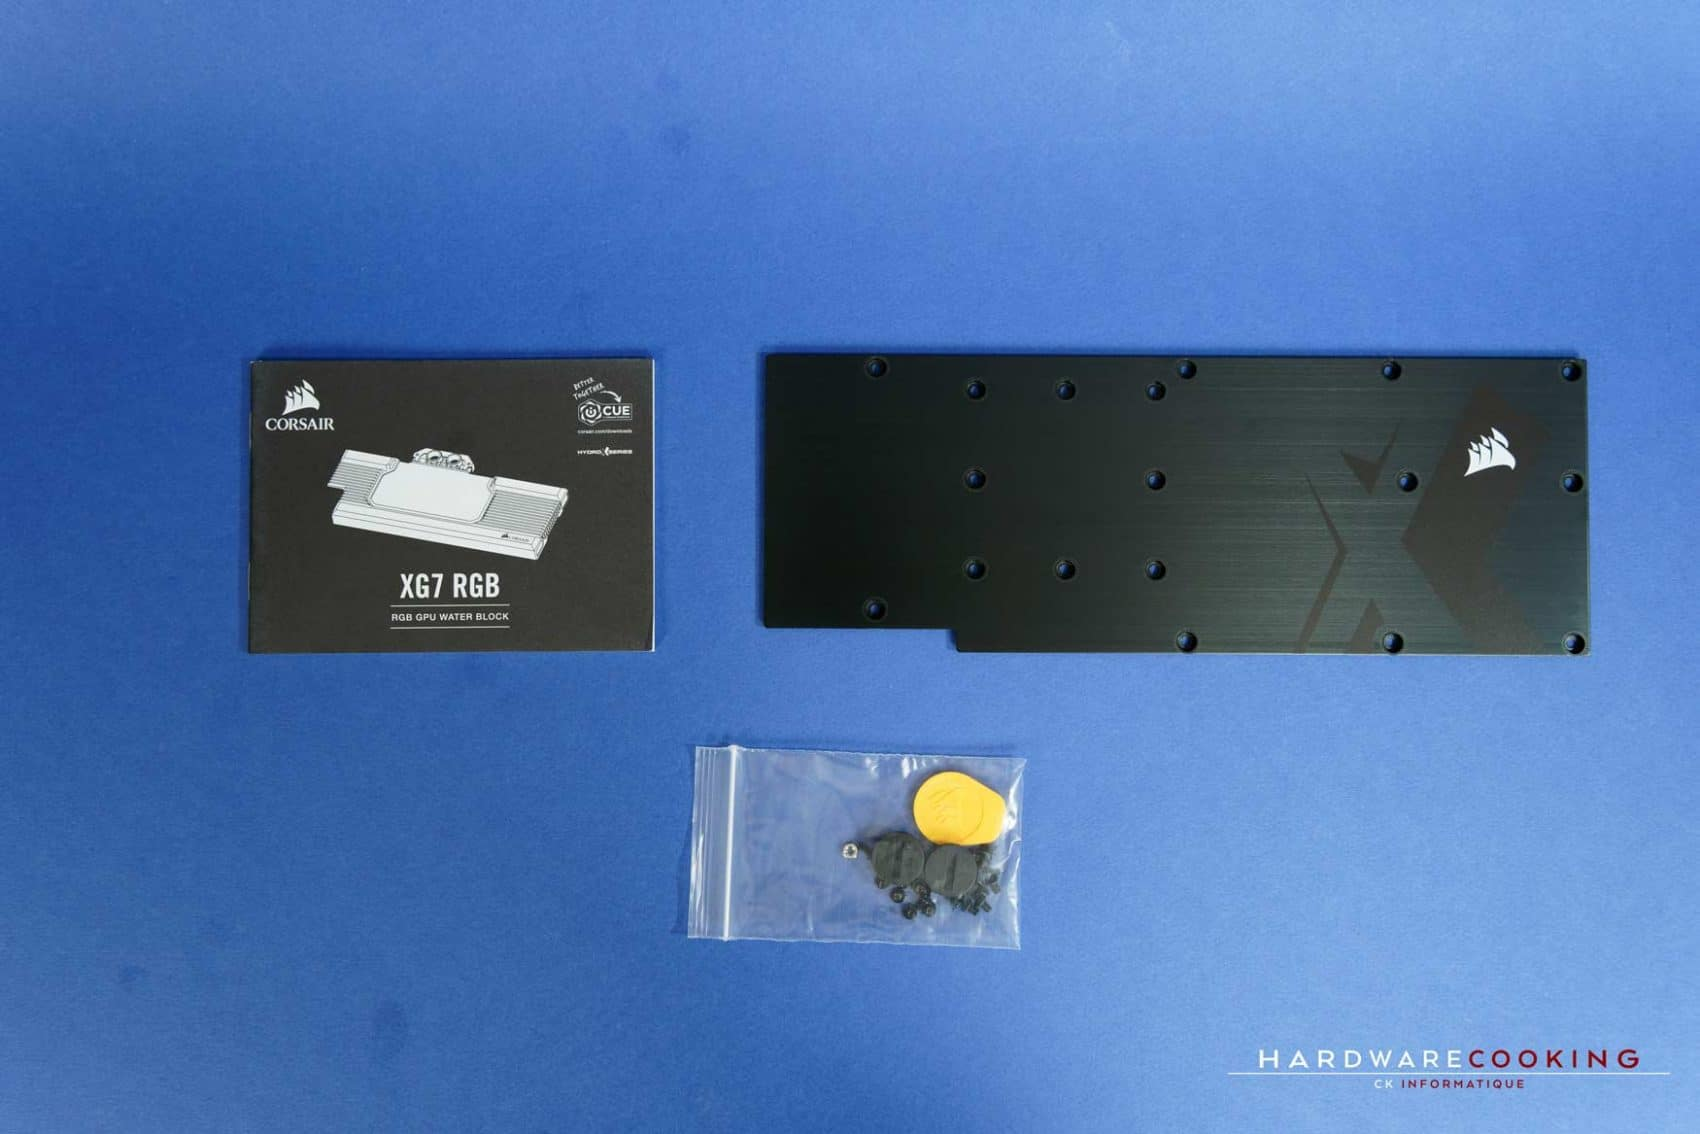 Bundle Corsair XG7 RGB